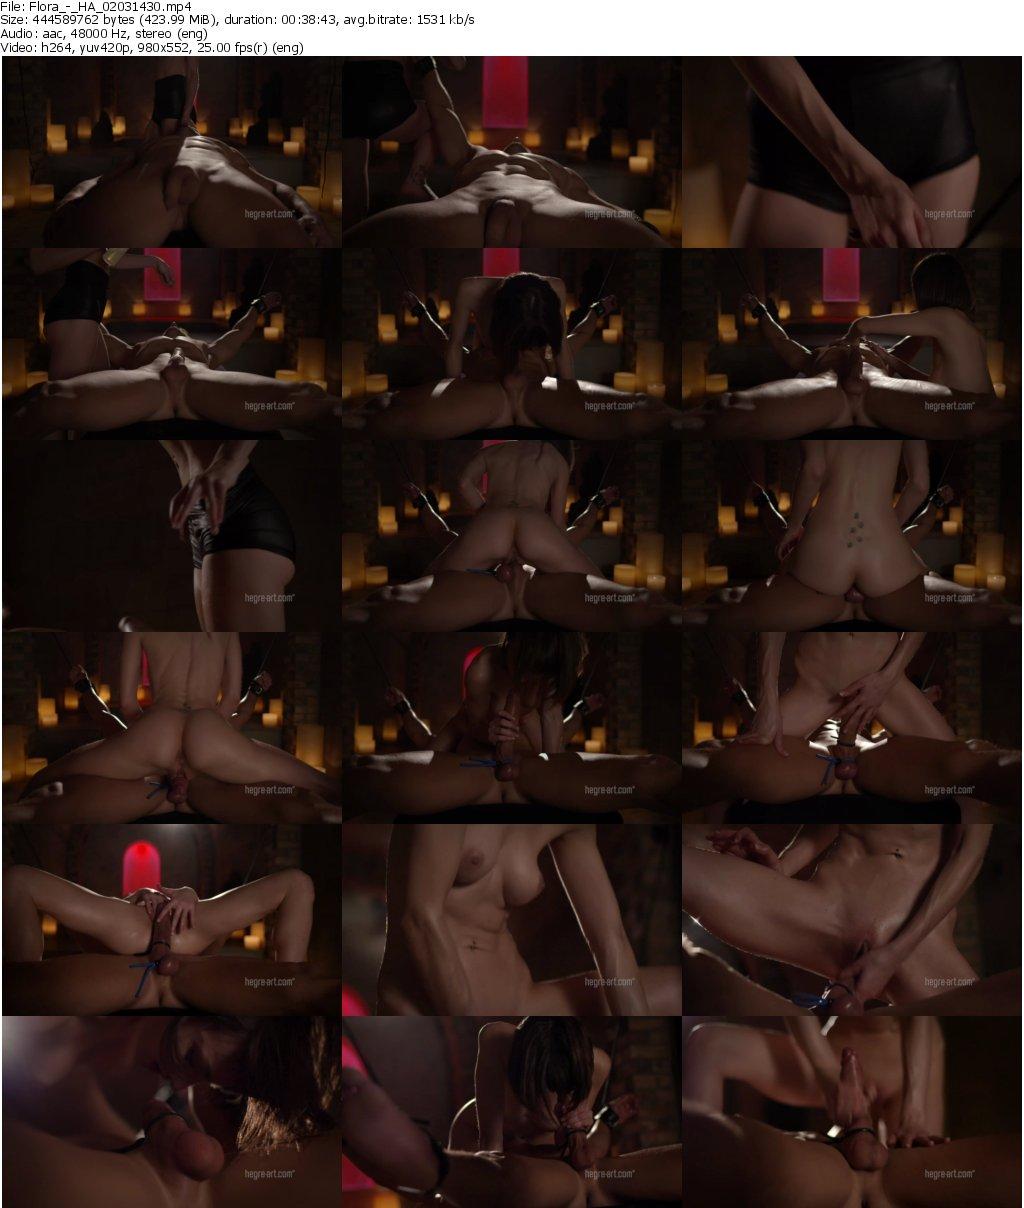 Bondage Femdom Massage Hd Porn Boob Community Kiss Type Pissing Video Post Jpg 1024x1208